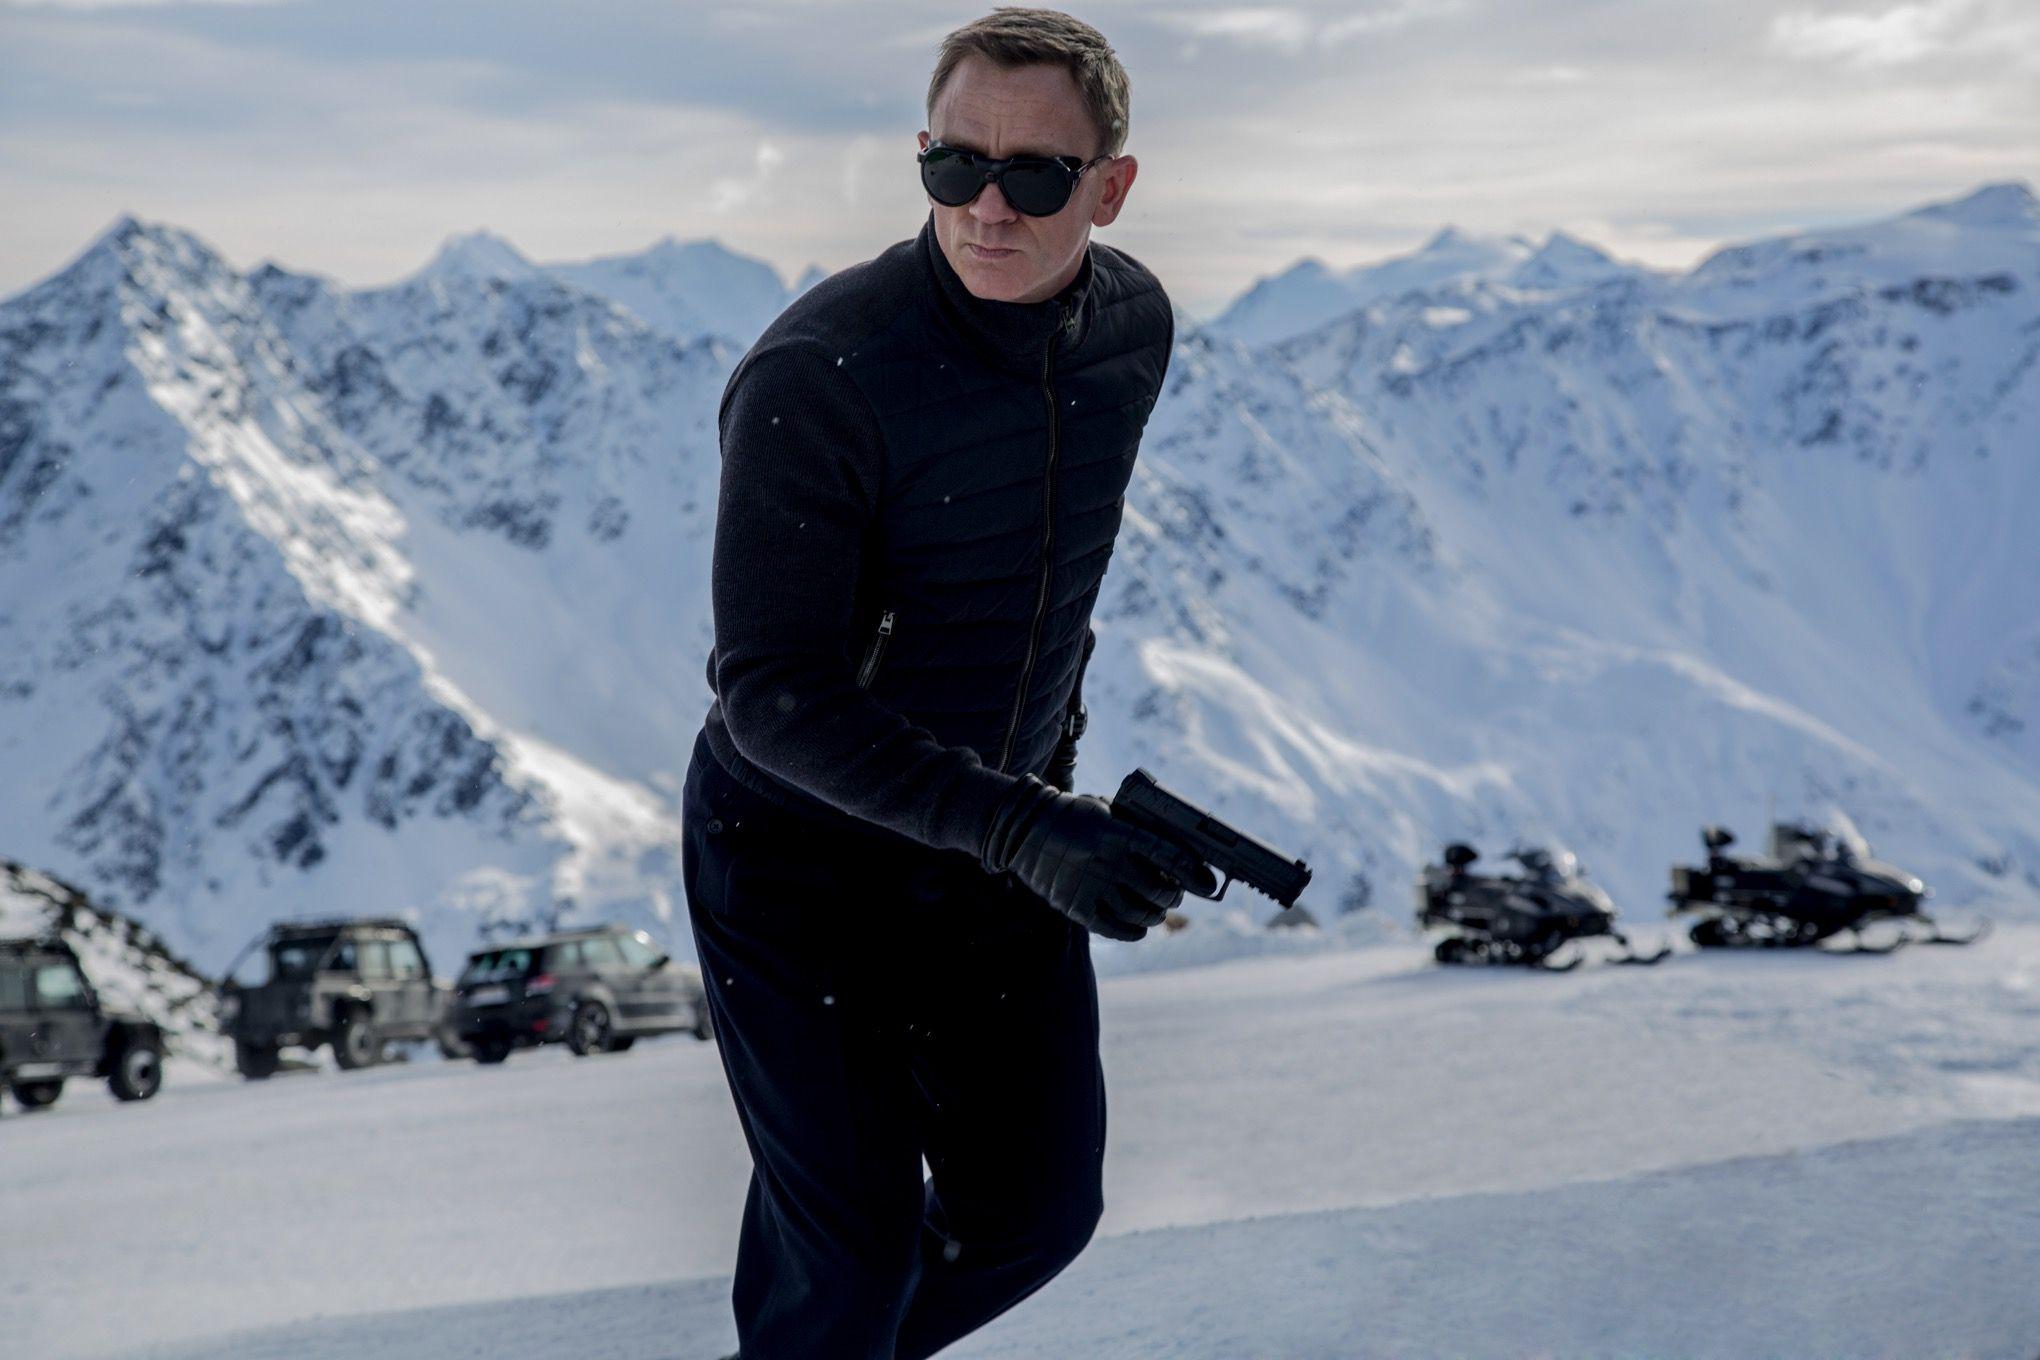 James-Bond-Spectre-HK-VP9